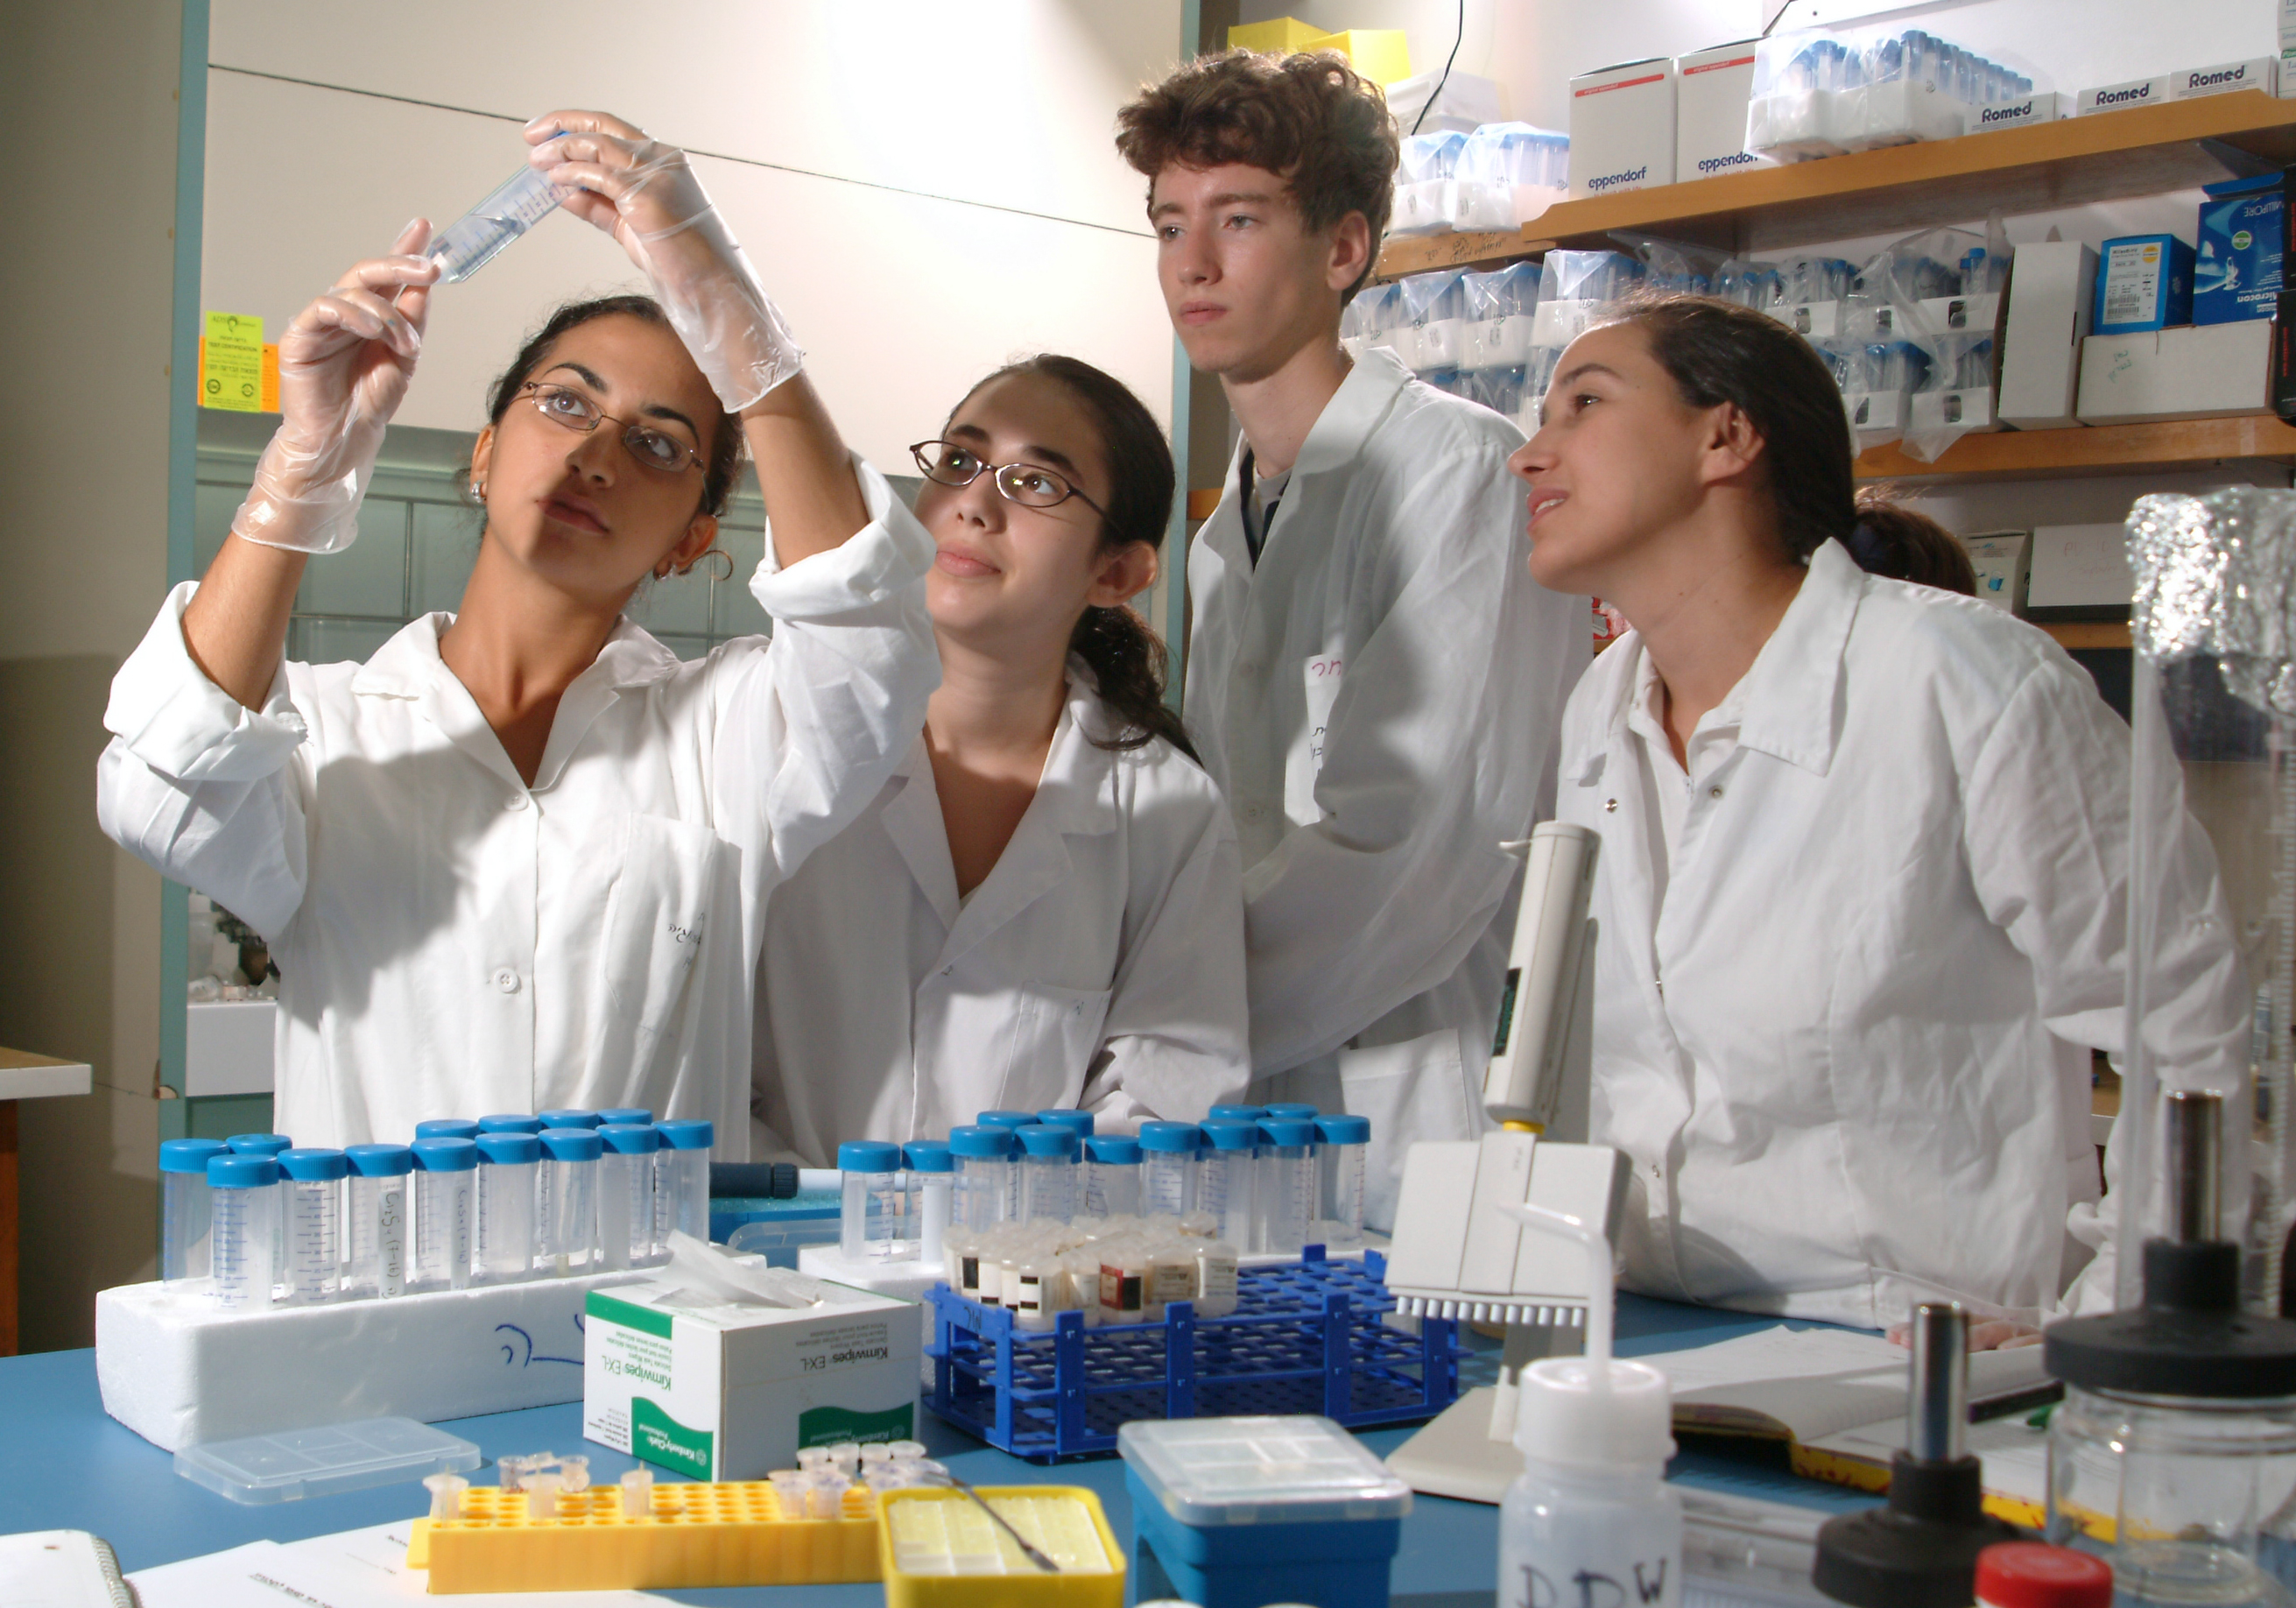 Summer Program - Chemistry | SciTech Technion - International Reseach Summer Program in Israel